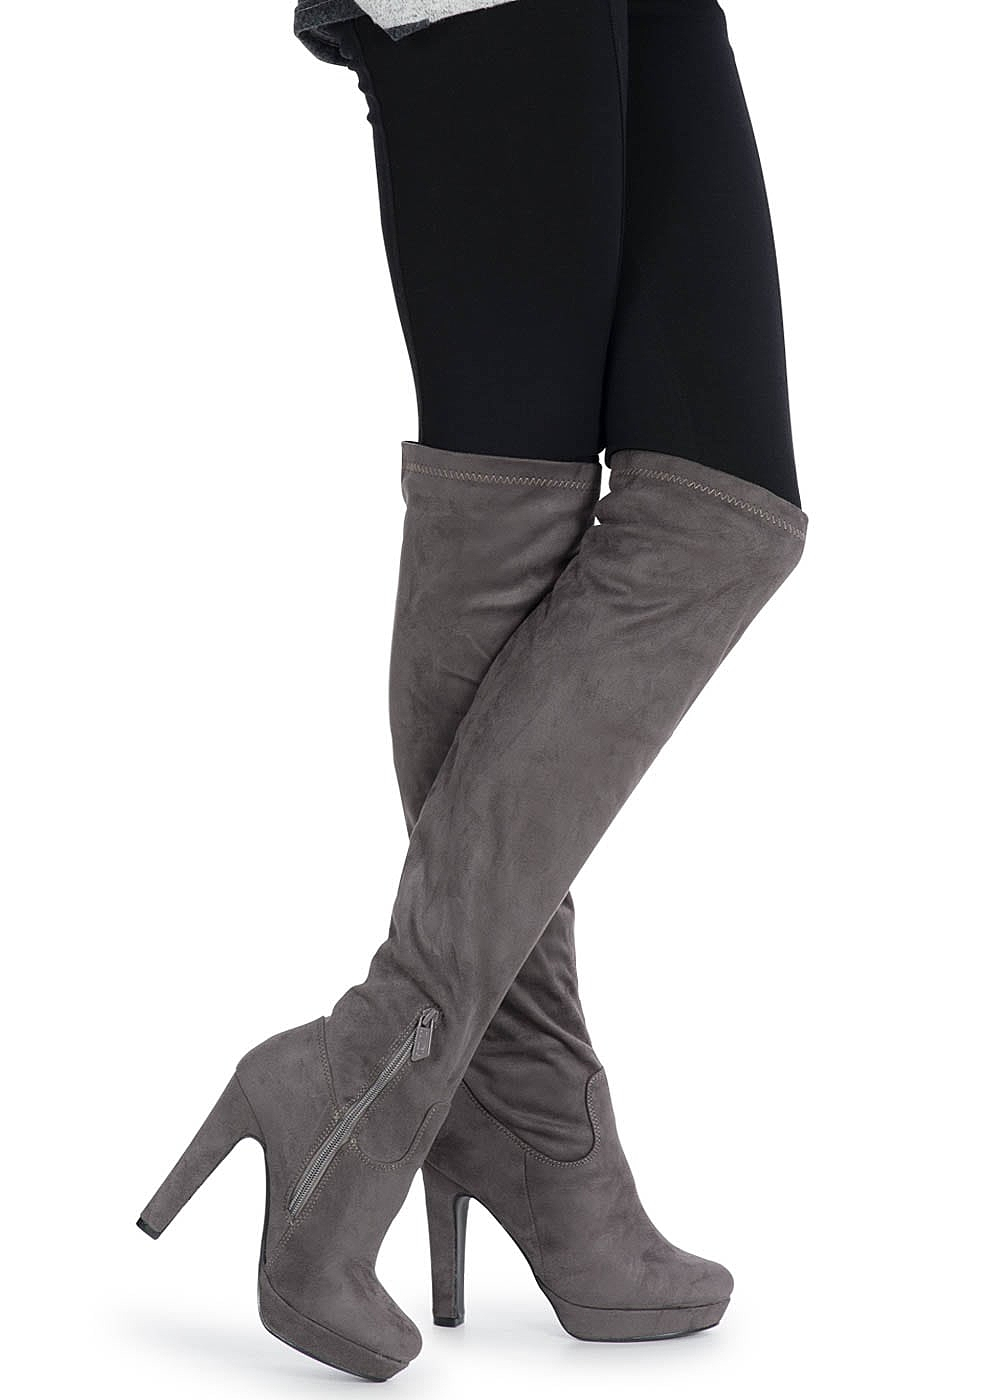 free shipping 15fca db13a Seventyseven Lifestyle Schuh Overknee Plateau Stiefel Absatz 12cm Zipper  grau